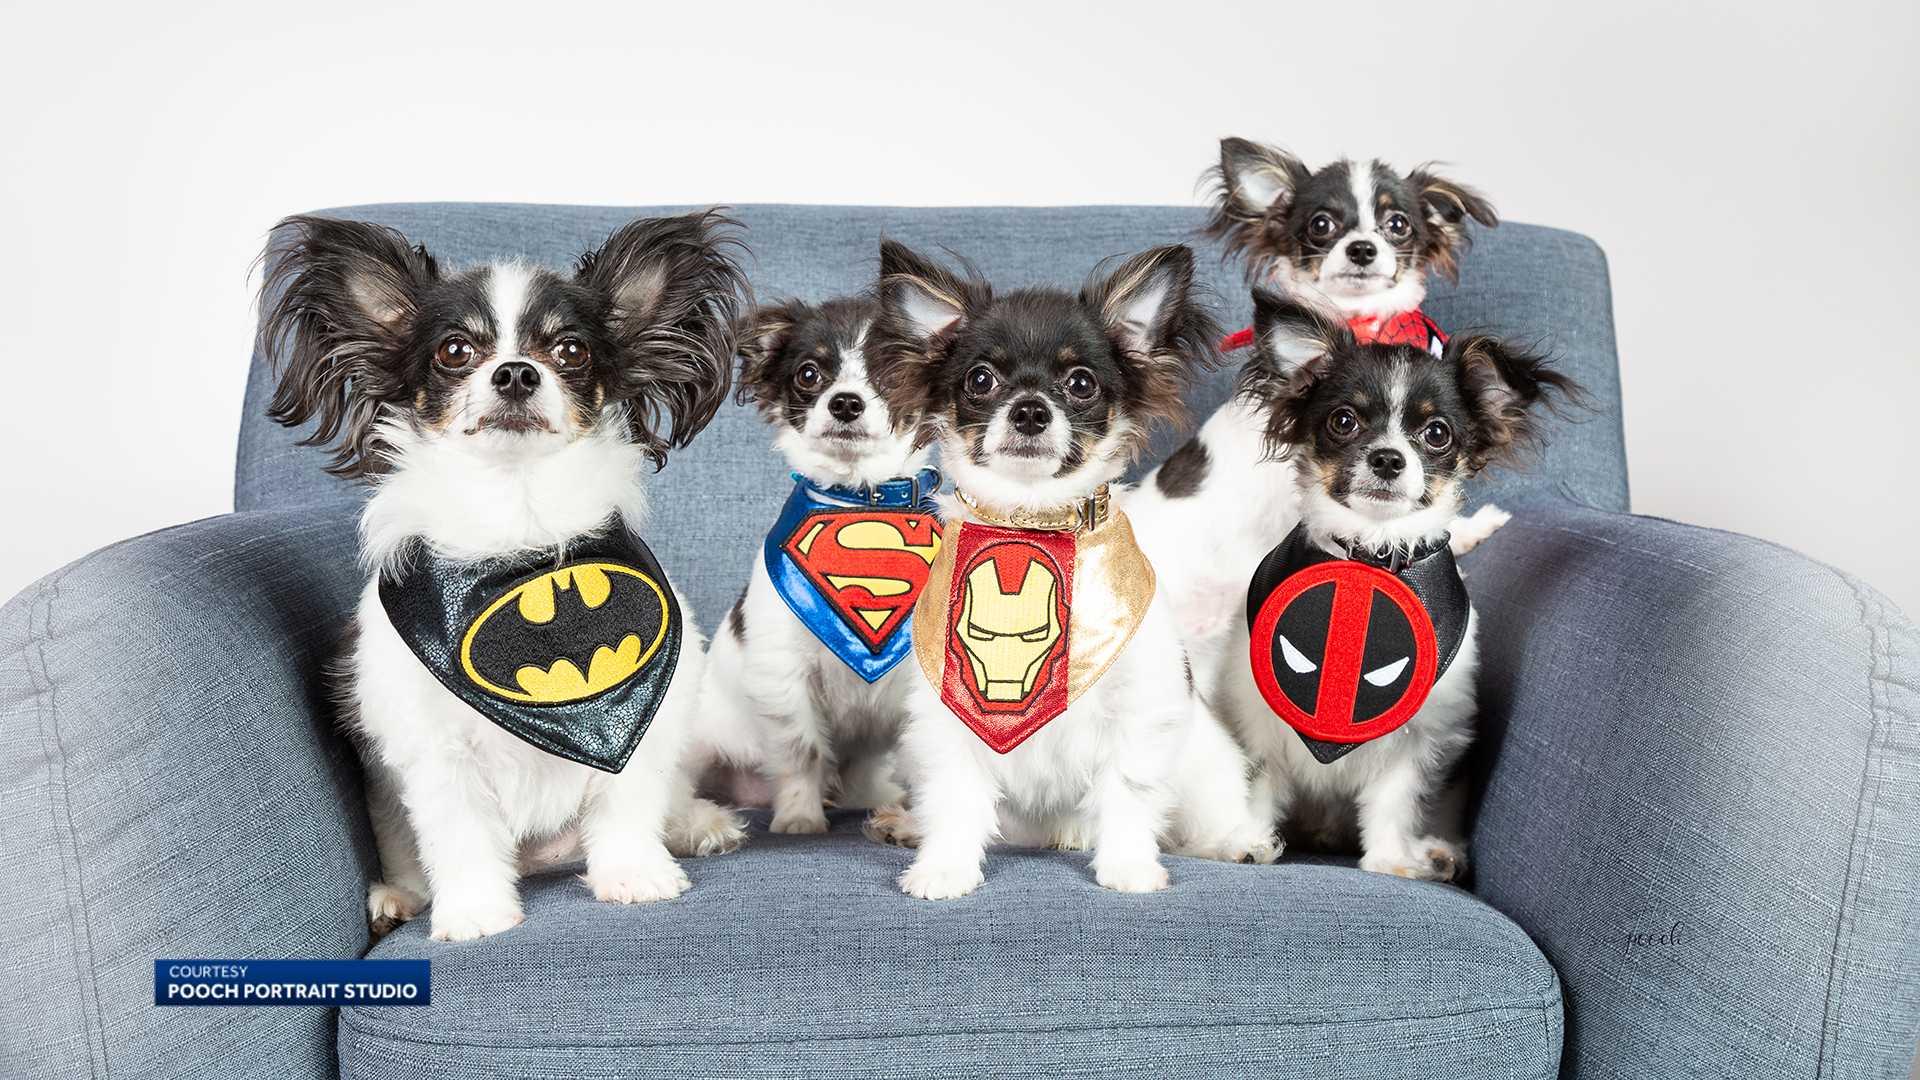 Meesha Kauffman's cloned dogs